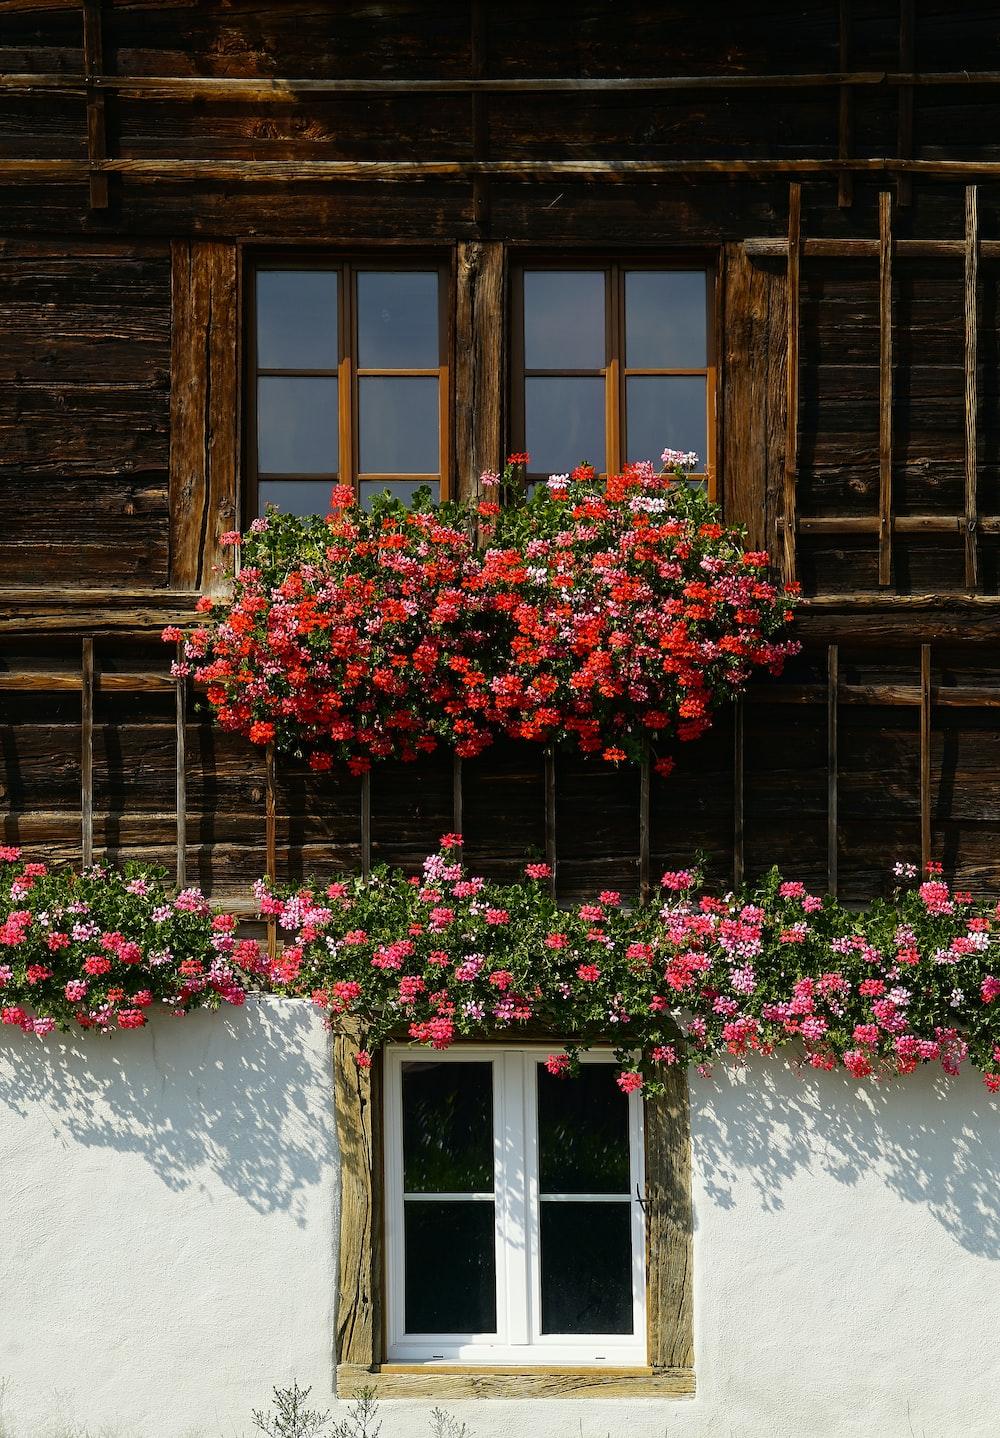 Flower Decoration Pictures | Download Free Images on Unsplash